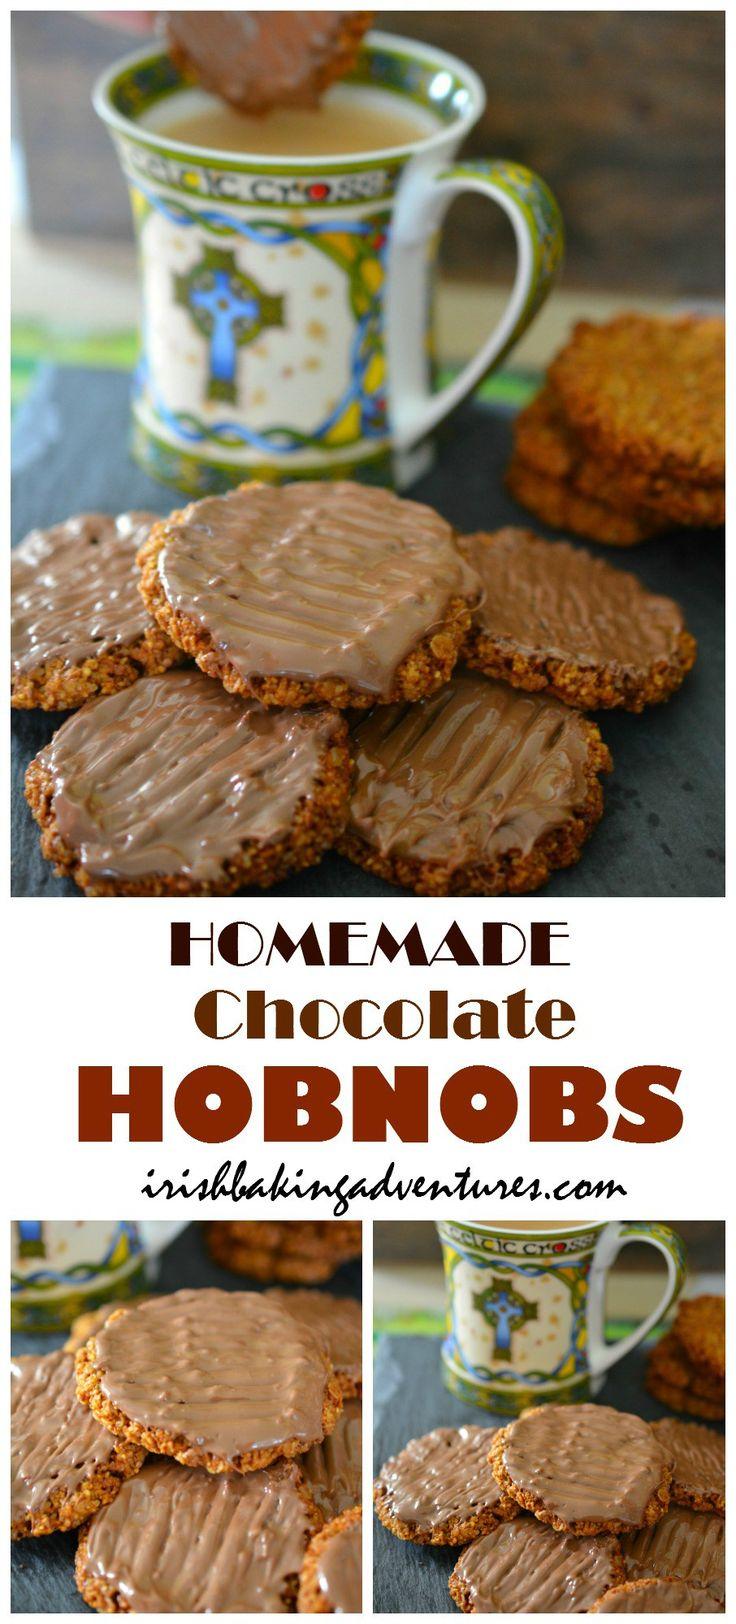 CHOCOLATE COATED HOBNOB BISCUITS